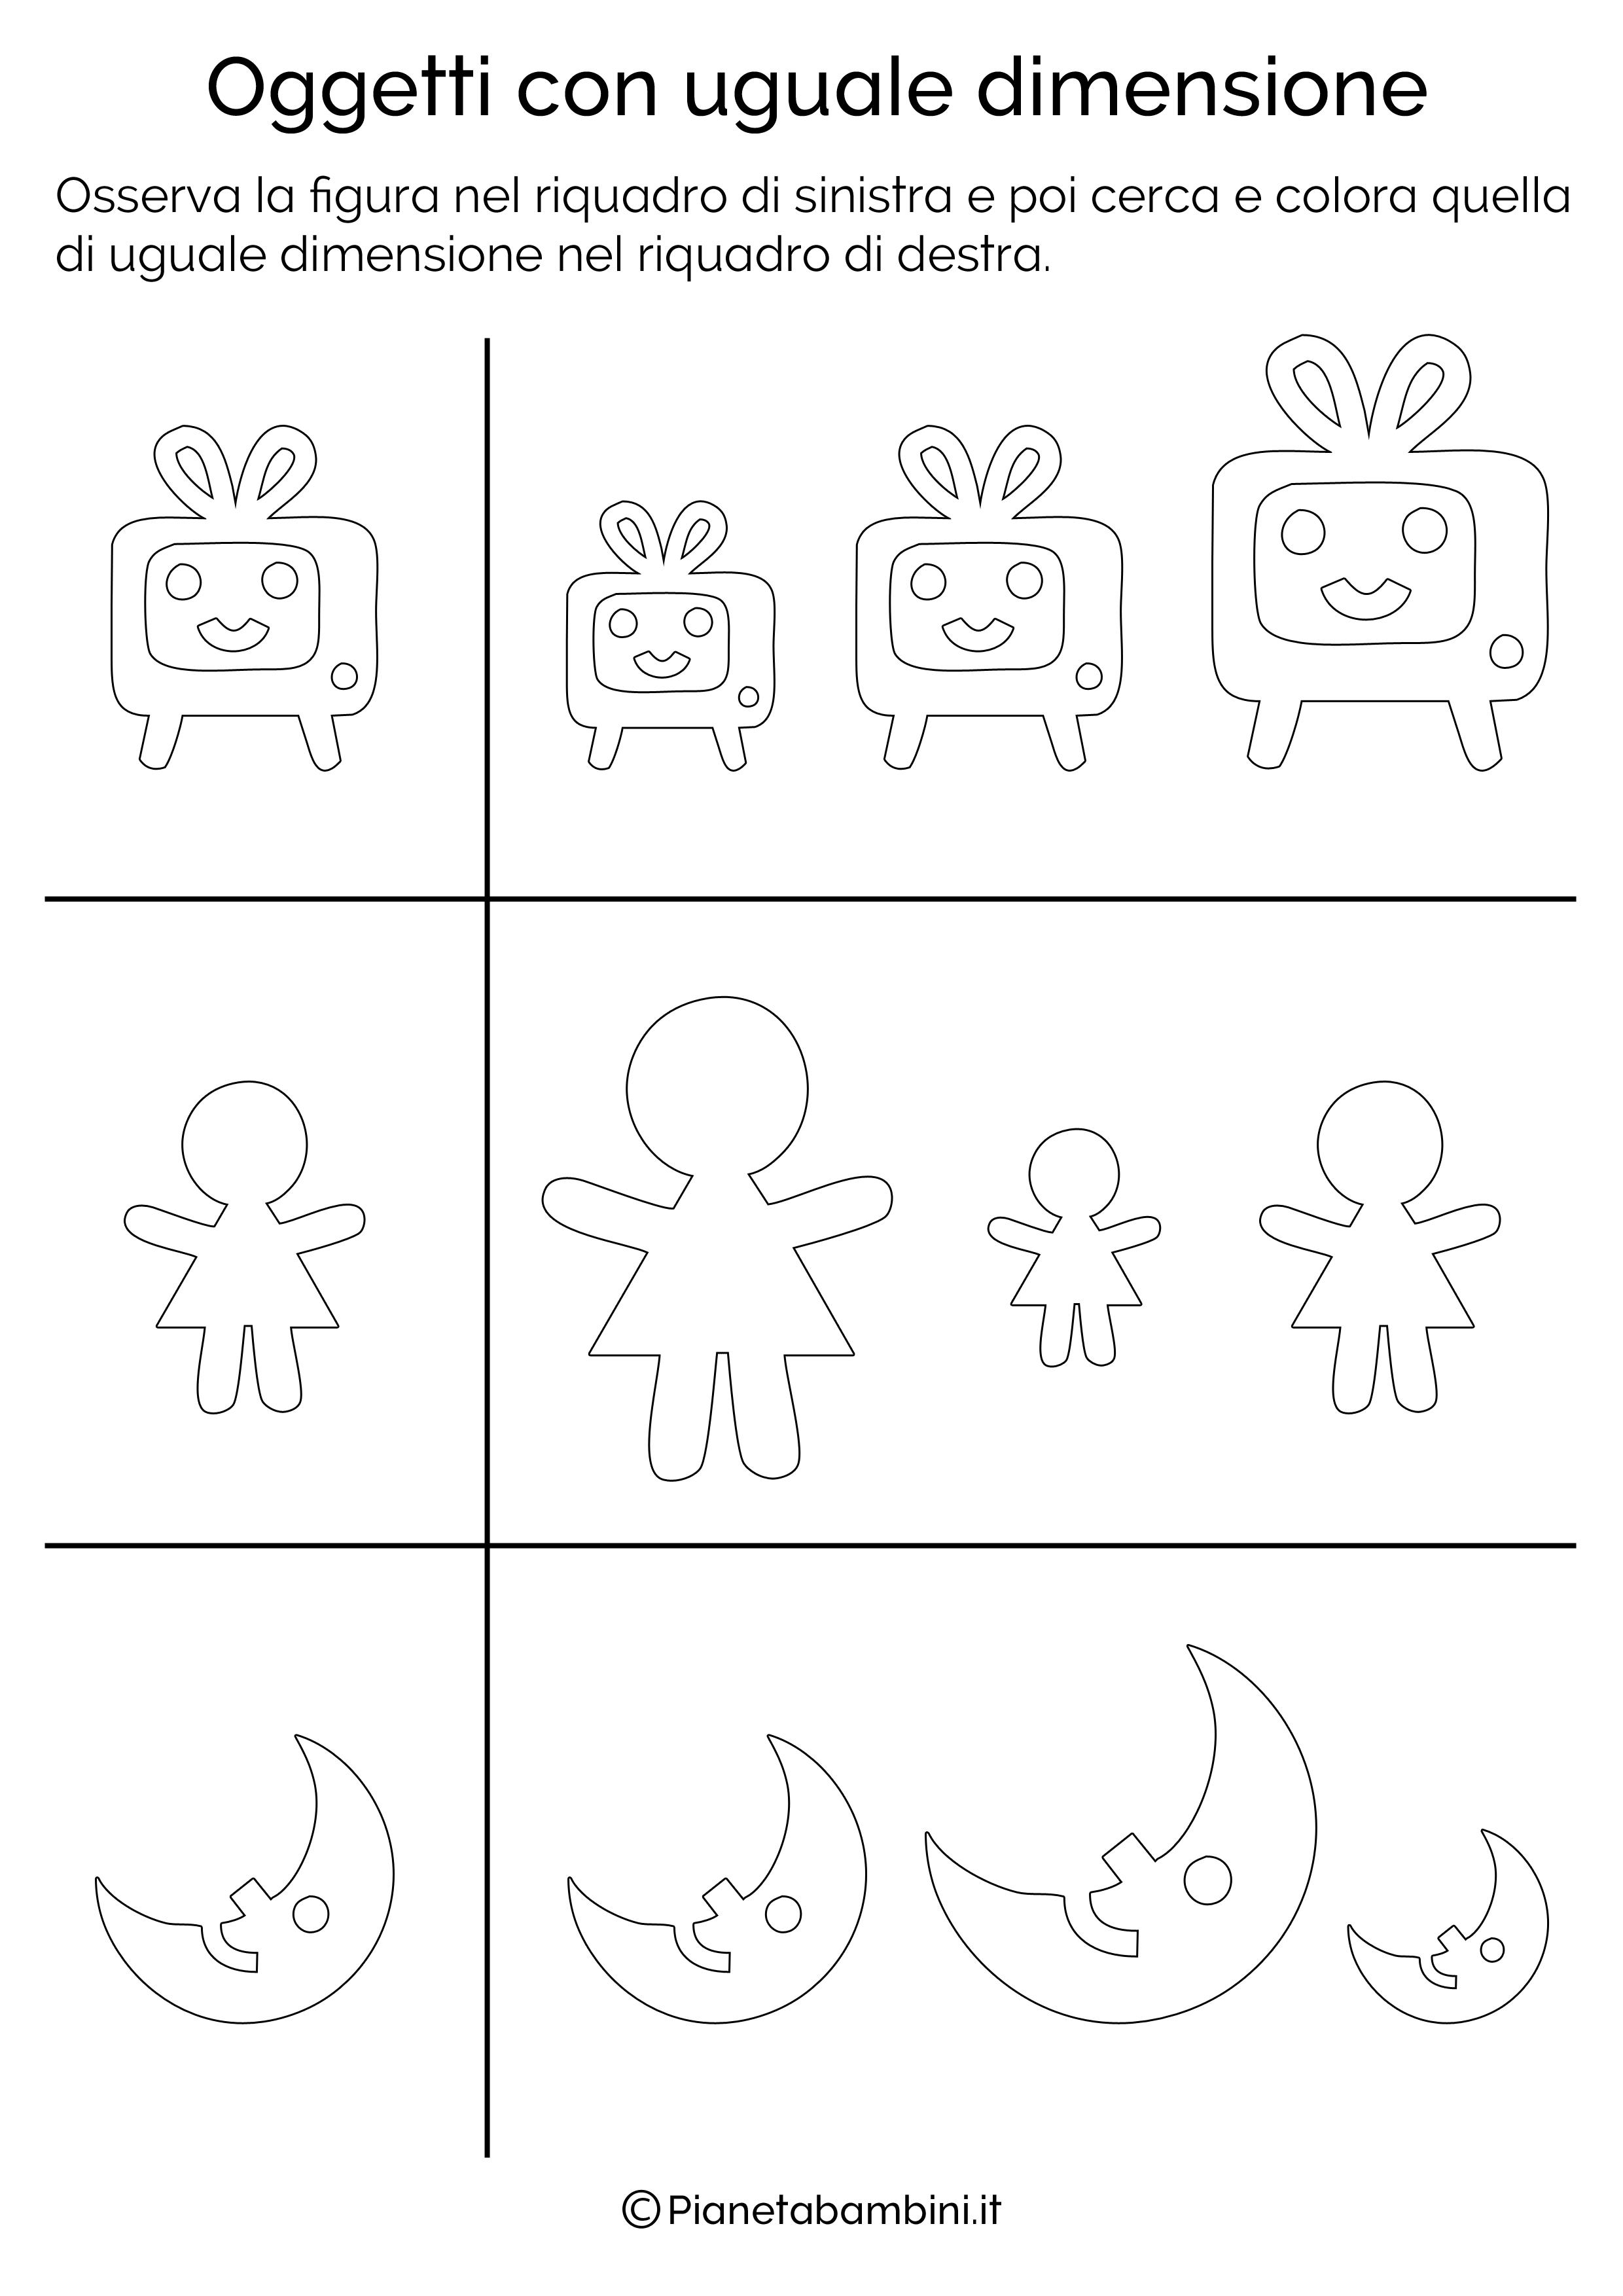 Esercizi-Oggetti-Uguale-Dimensione-1